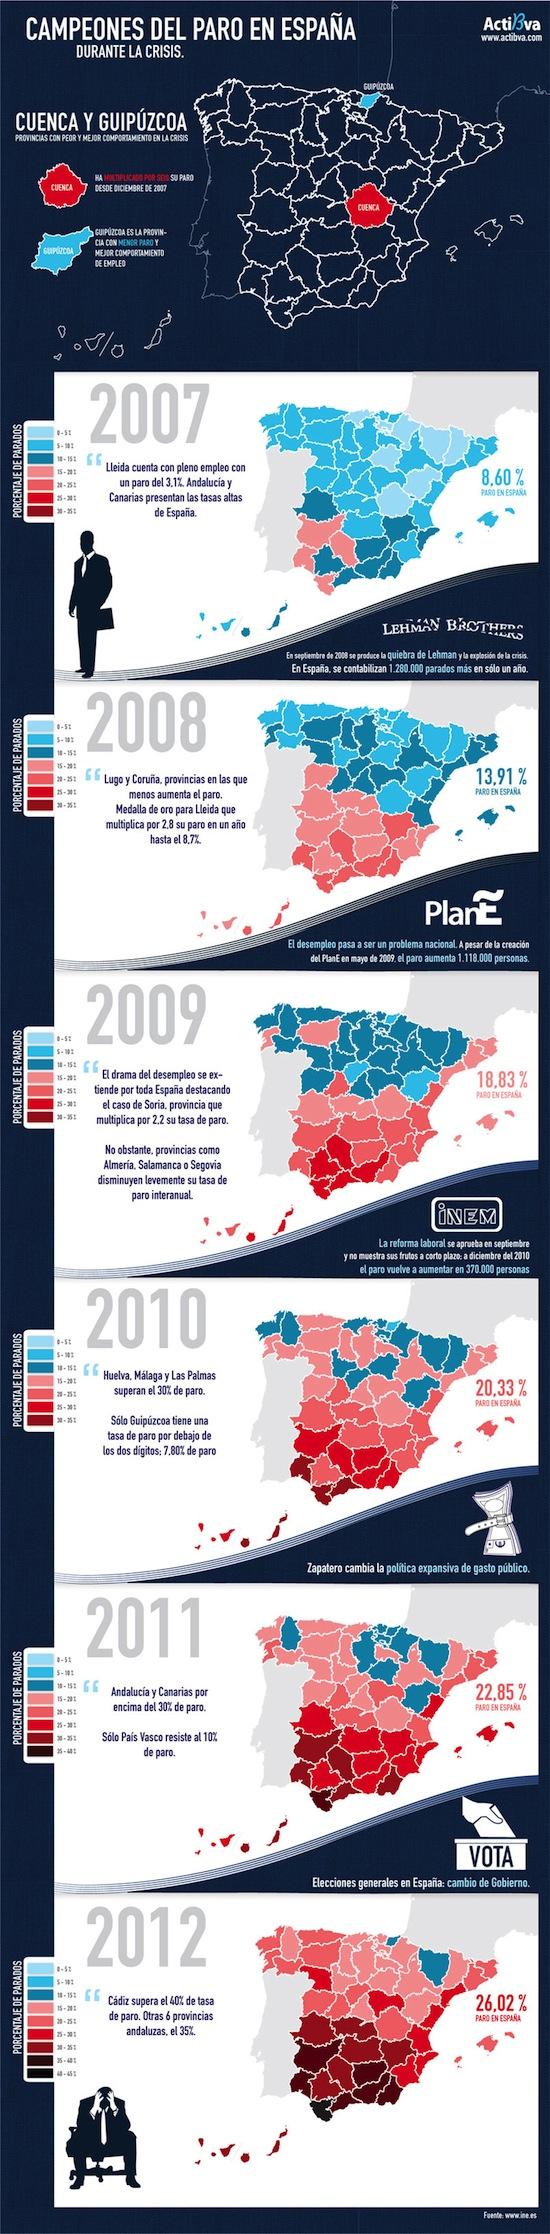 Mapa del paro en España 2007-2012